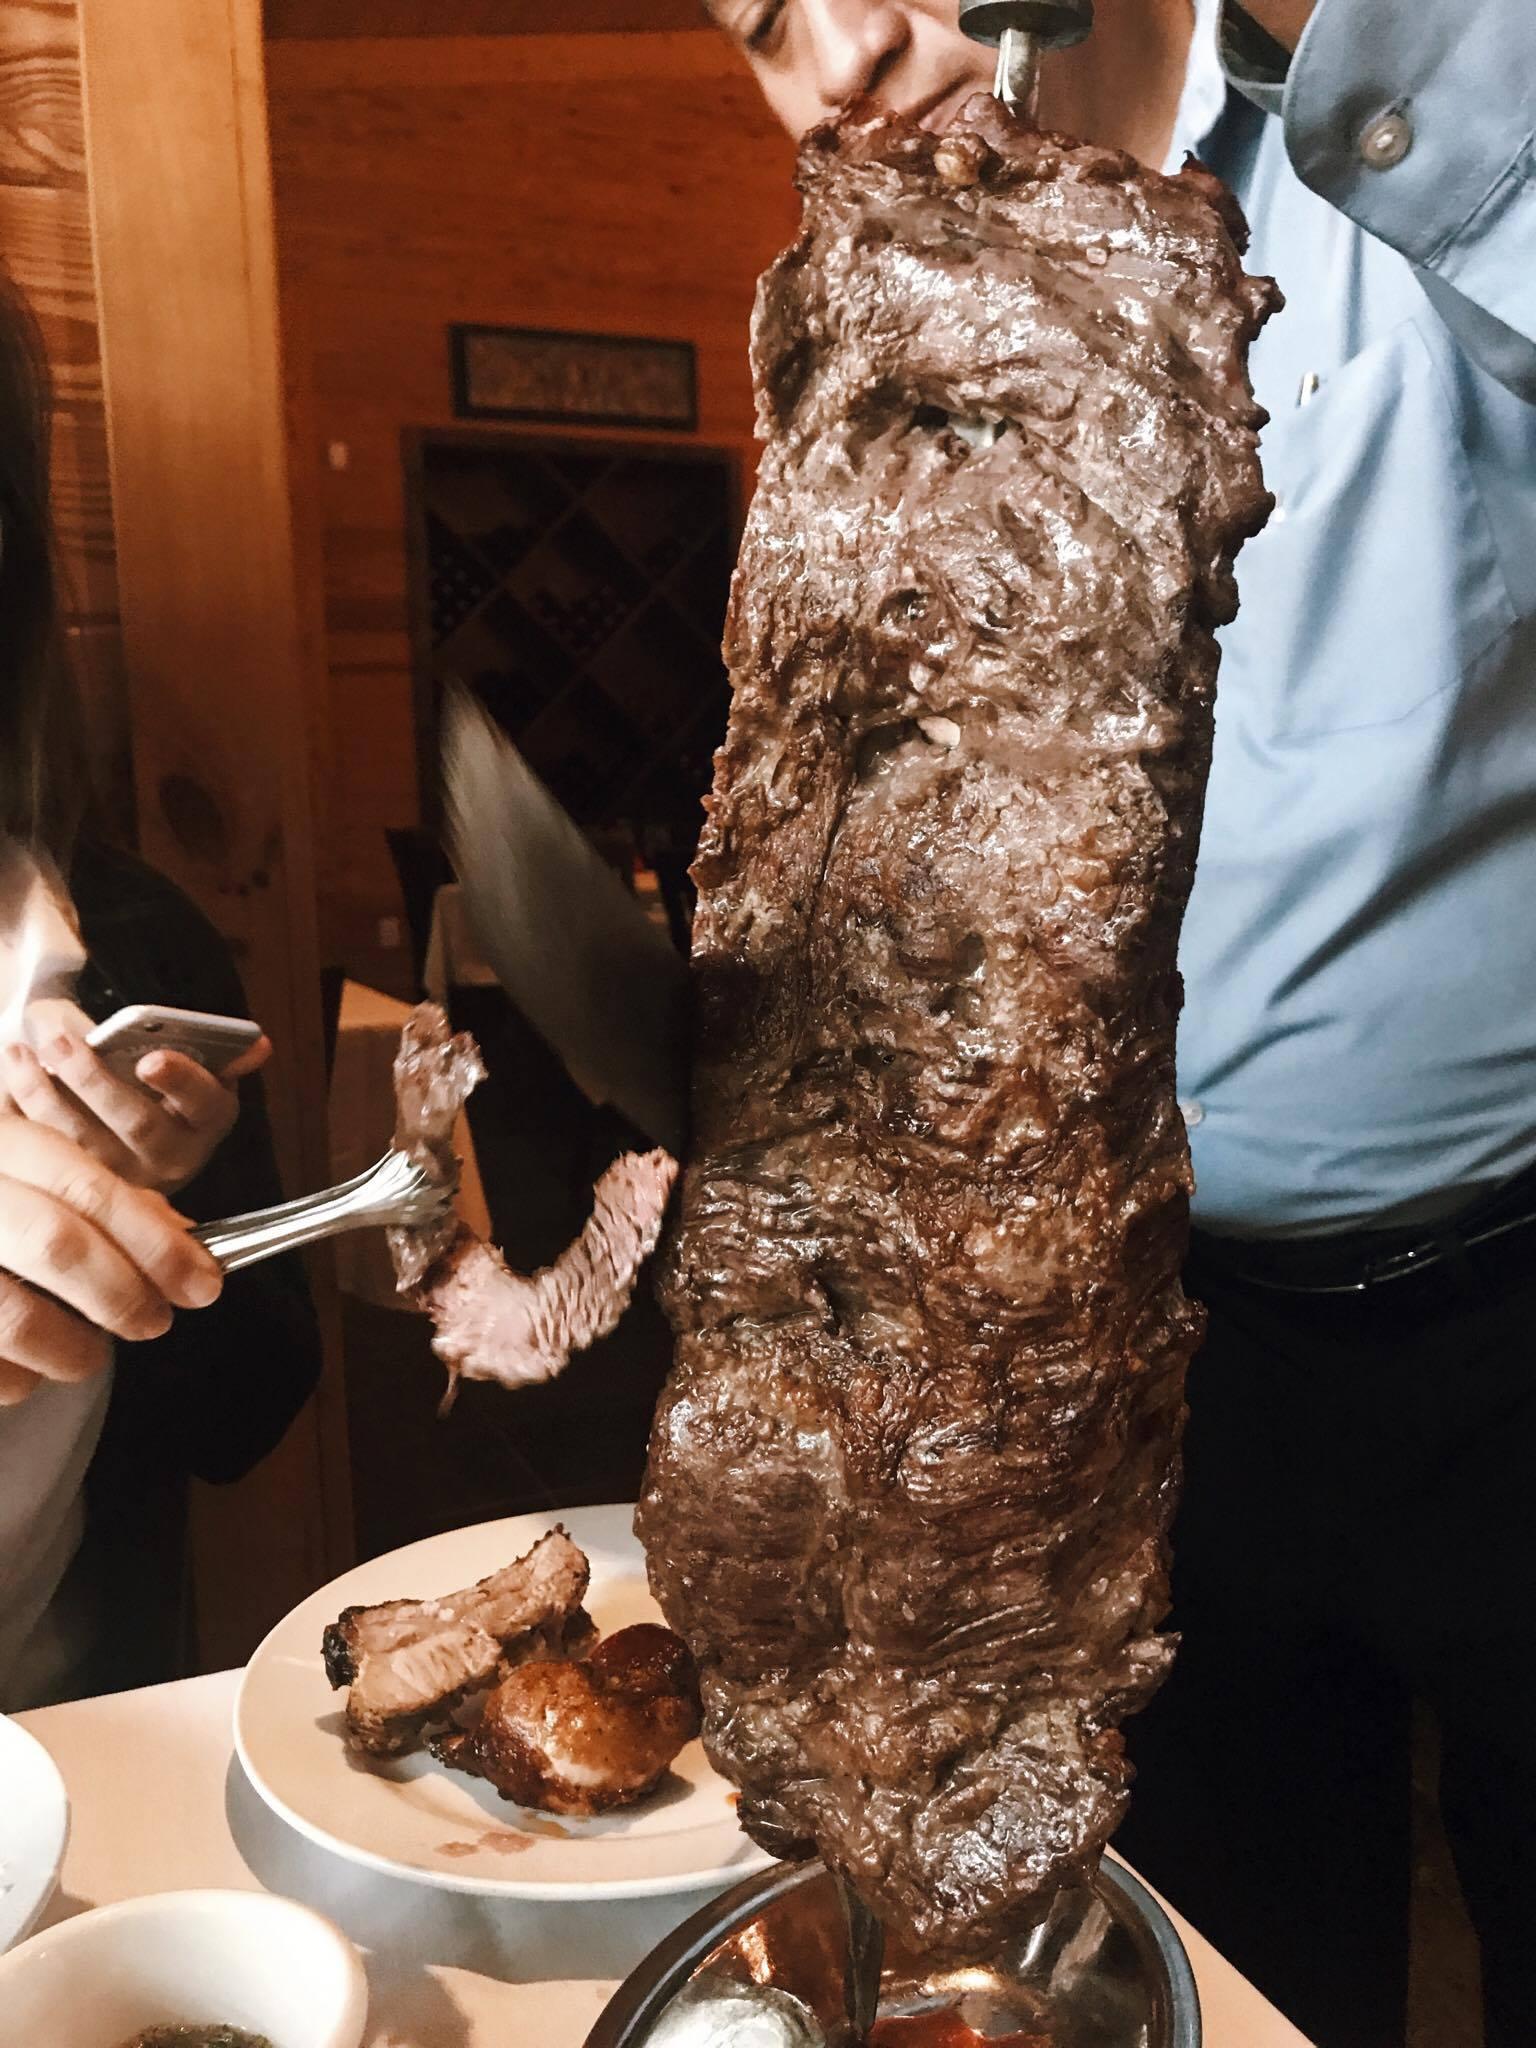 Best South American and Latin Food in Austin, Tx - Fumaca Gaucha Steakhouse by www.tresgigi.com